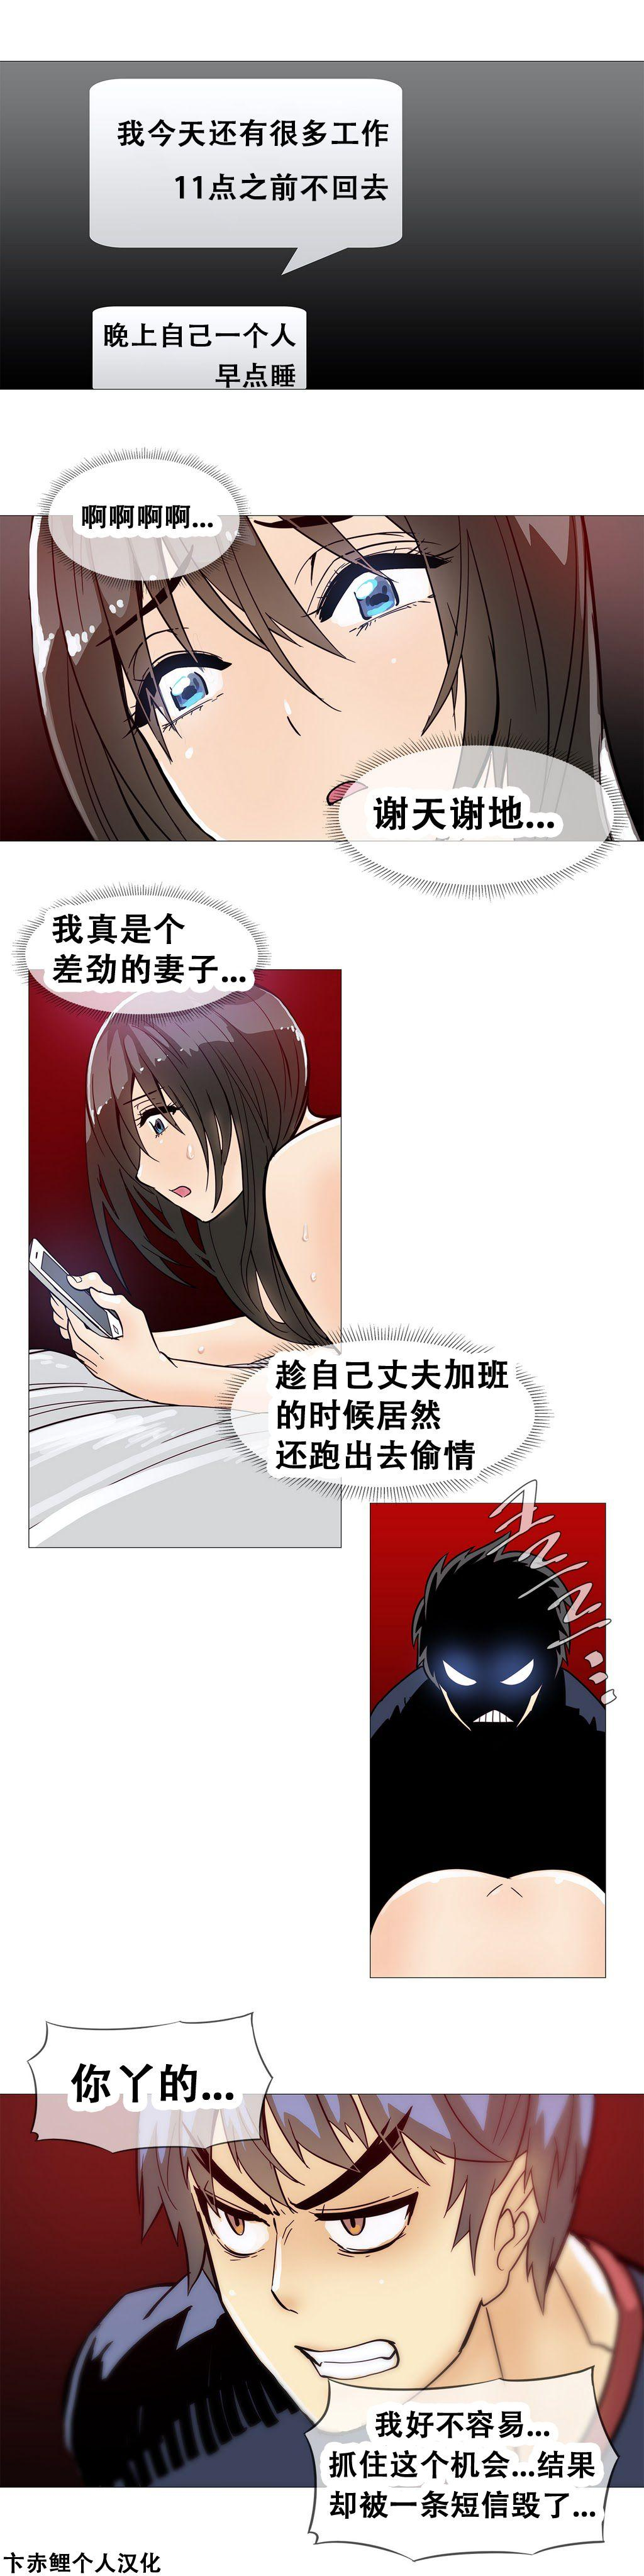 HouseHold Affairs 【卞赤鲤汉化】1~15话 266